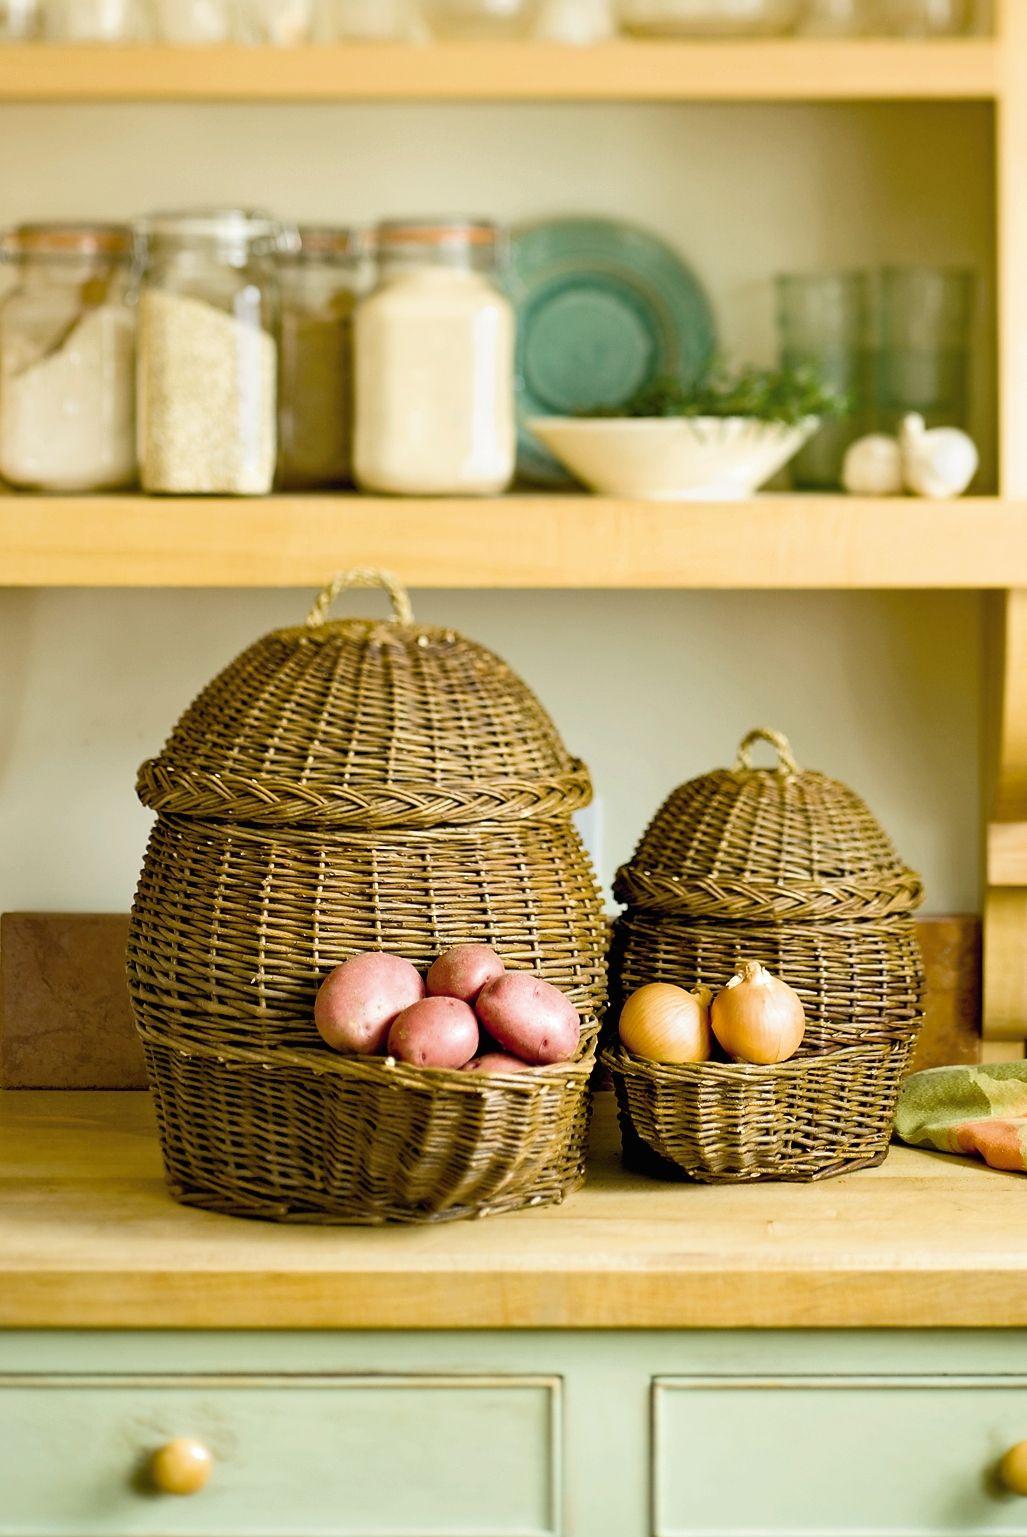 Onion Potato Storage Baskets Free Shipping Gardeners Com